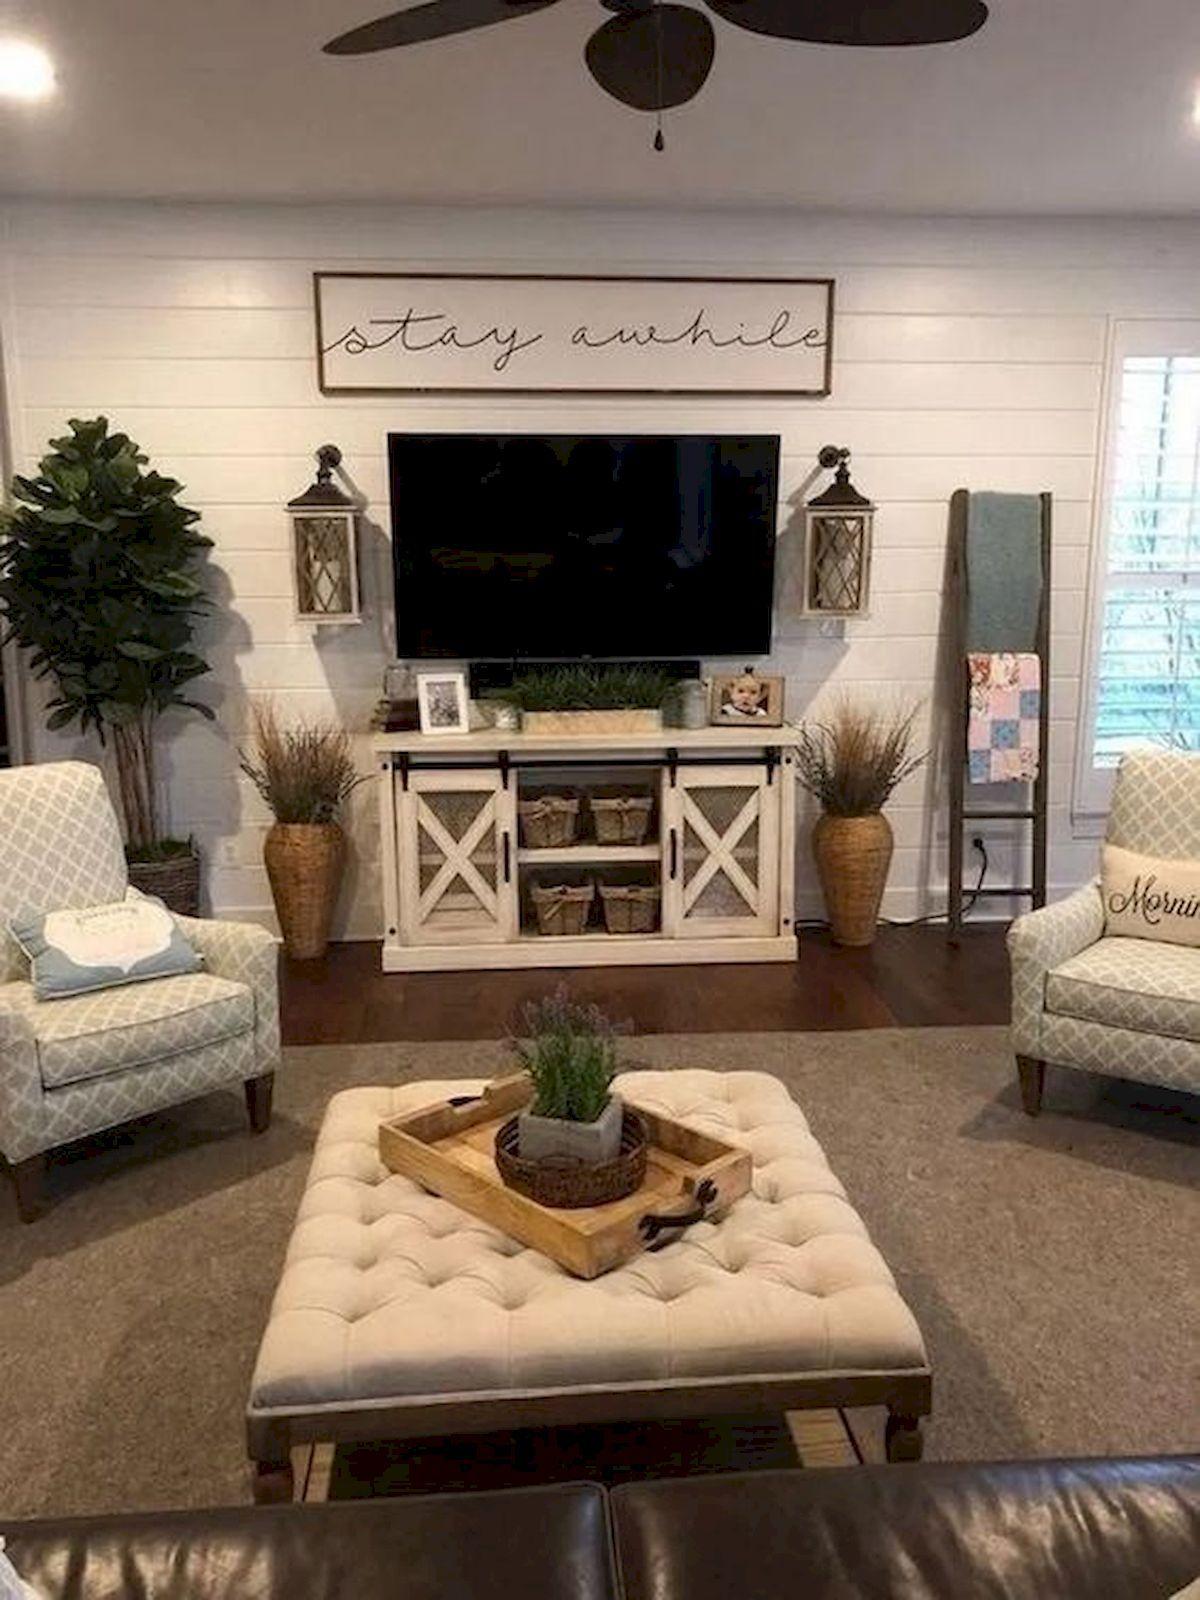 20 Awesome Farmhouse Living Room Design And Decor Ideas Farmhouse Decor Living Room Farm House Living Room Living Room Tv Stand